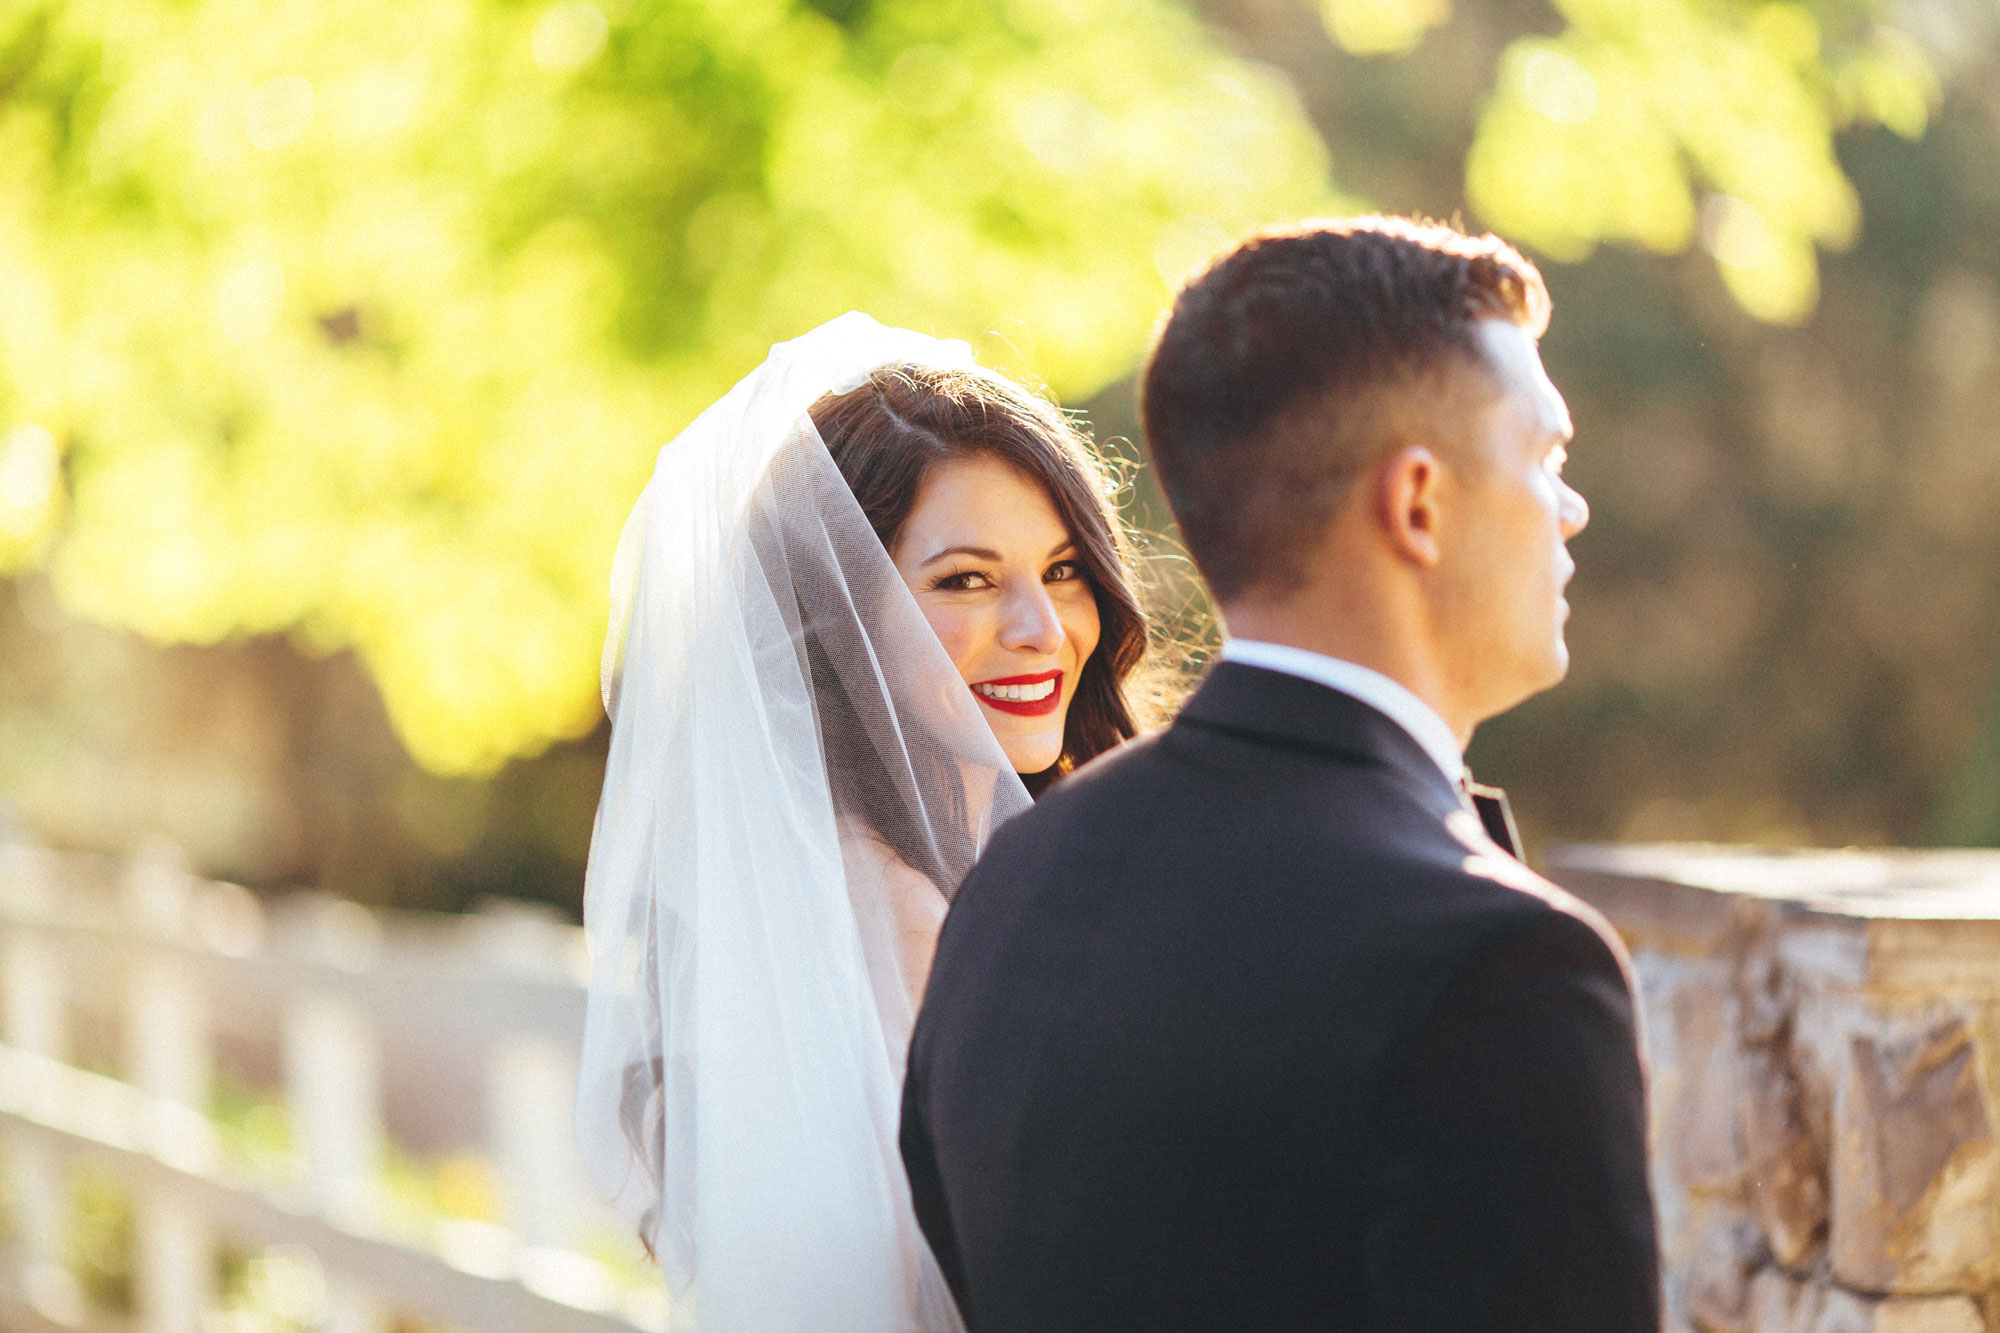 Me & Mr. Jones Wedding, Rustic Glam Wedding, Here Comes The Bride, Bride with Red Lipstick, Nashville Wedding, Black Tie Wedding